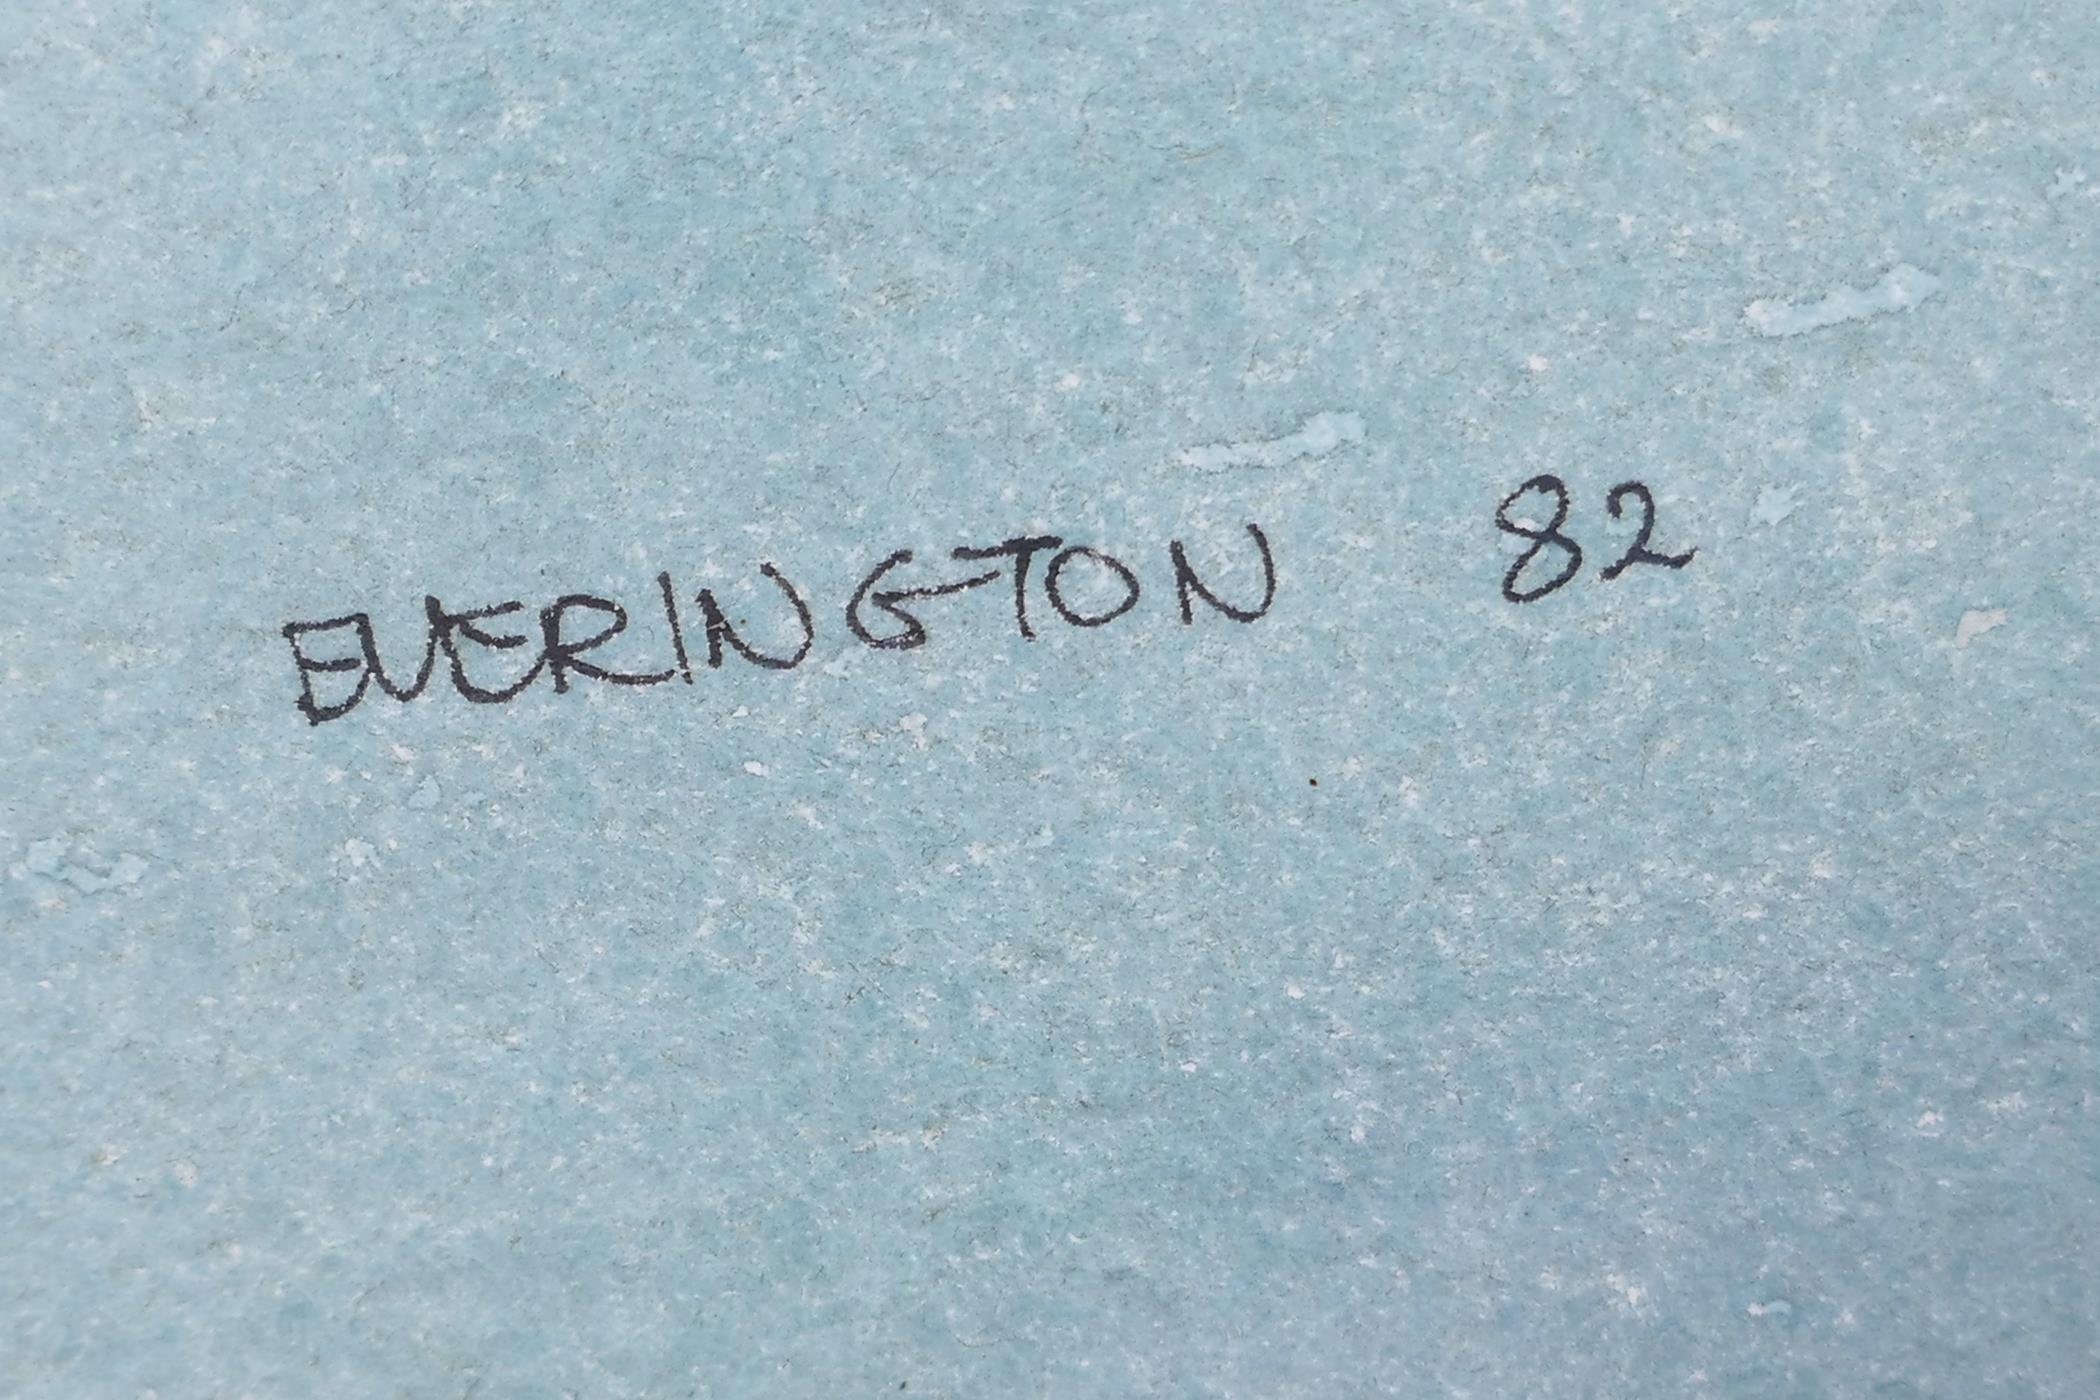 "Berrington, Venetian scene, signed and dated '82, watercolour, 21"" x 13½"" - Image 3 of 3"